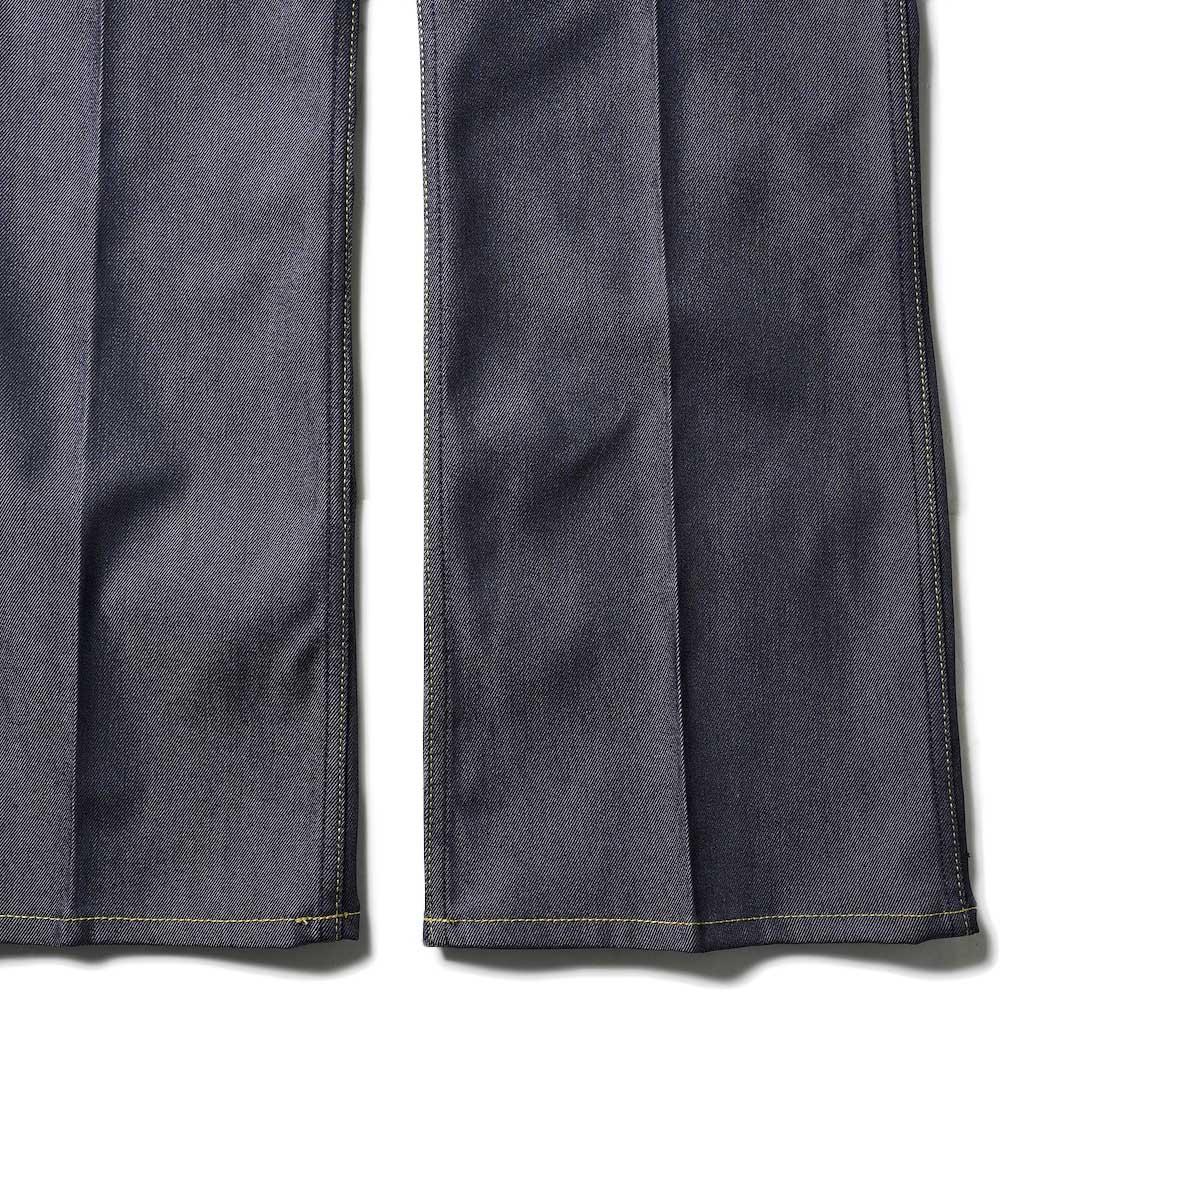 Needles / BOOT-CUT JEAN - 10.5OZ POLY TWILL (Navy)裾